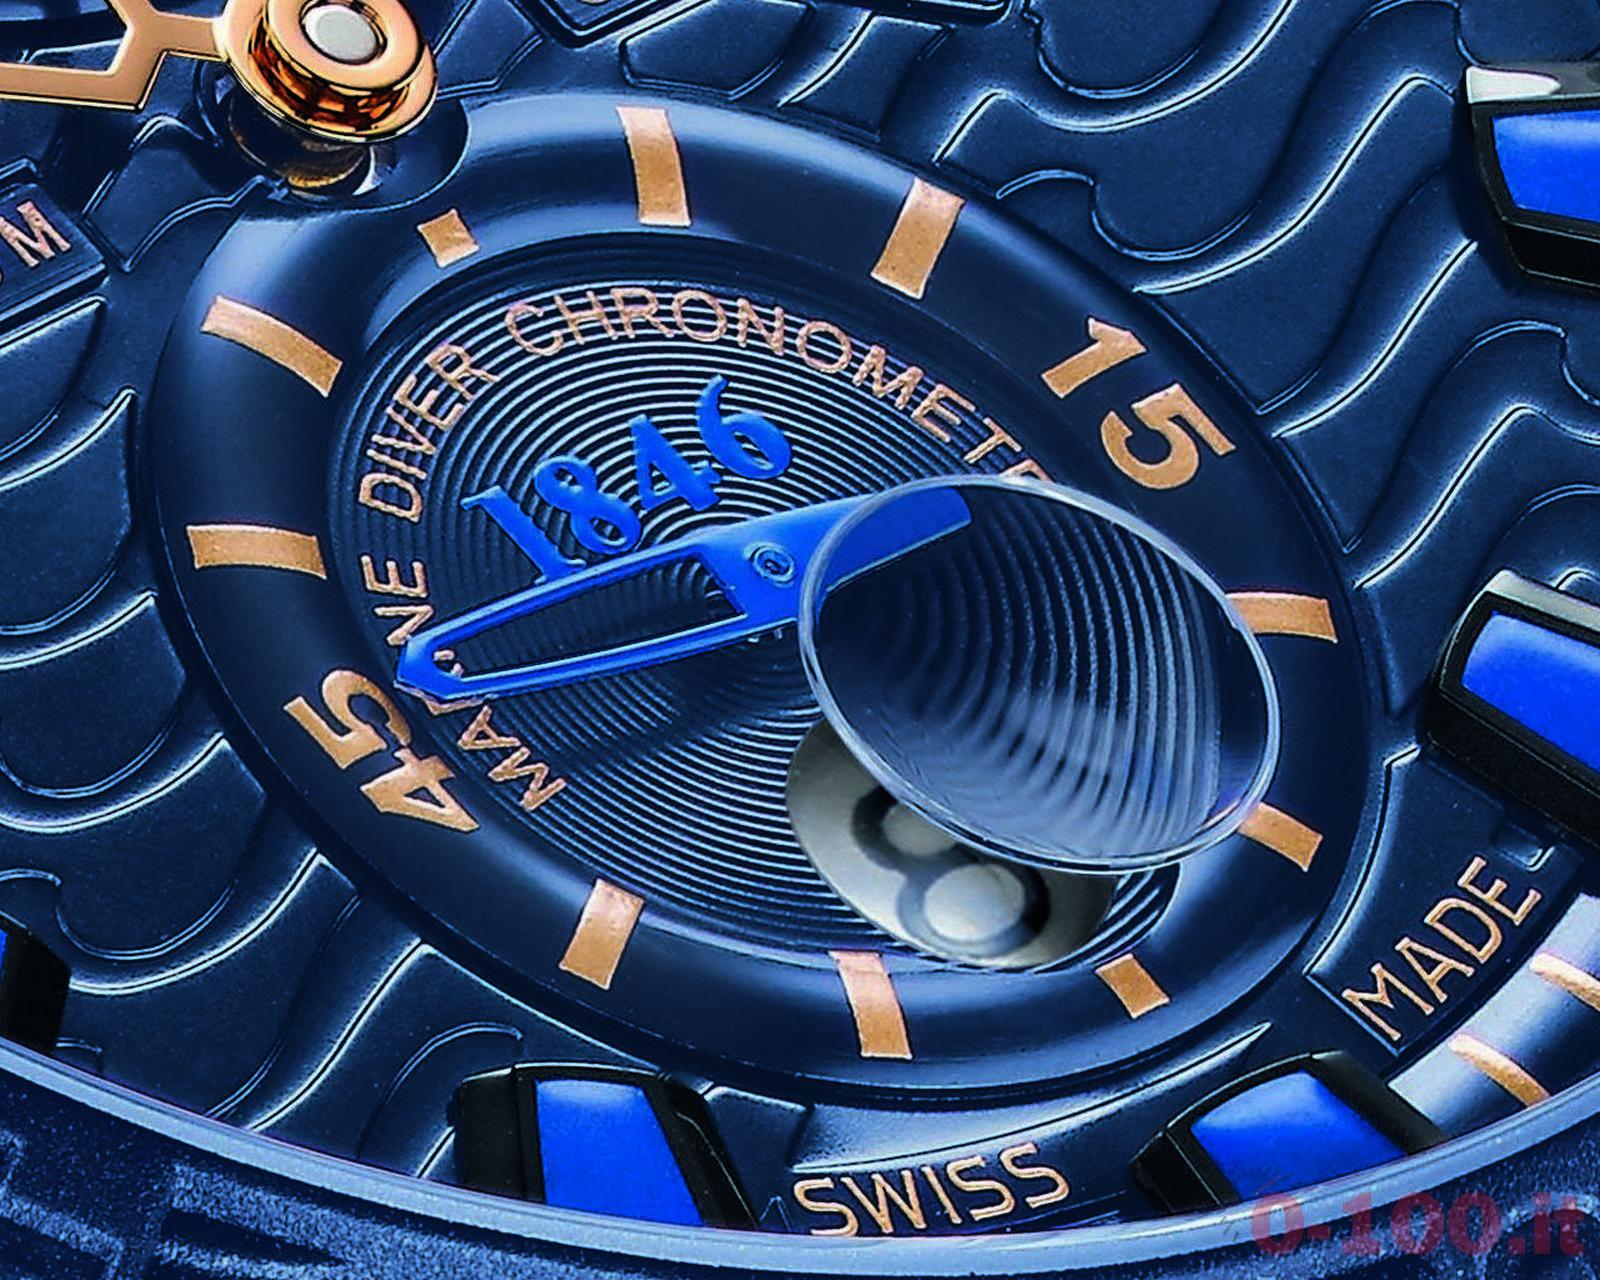 ulysse-nardin-blue-ocean-limited-edition-ref-263-99le-3c-price_0-1002